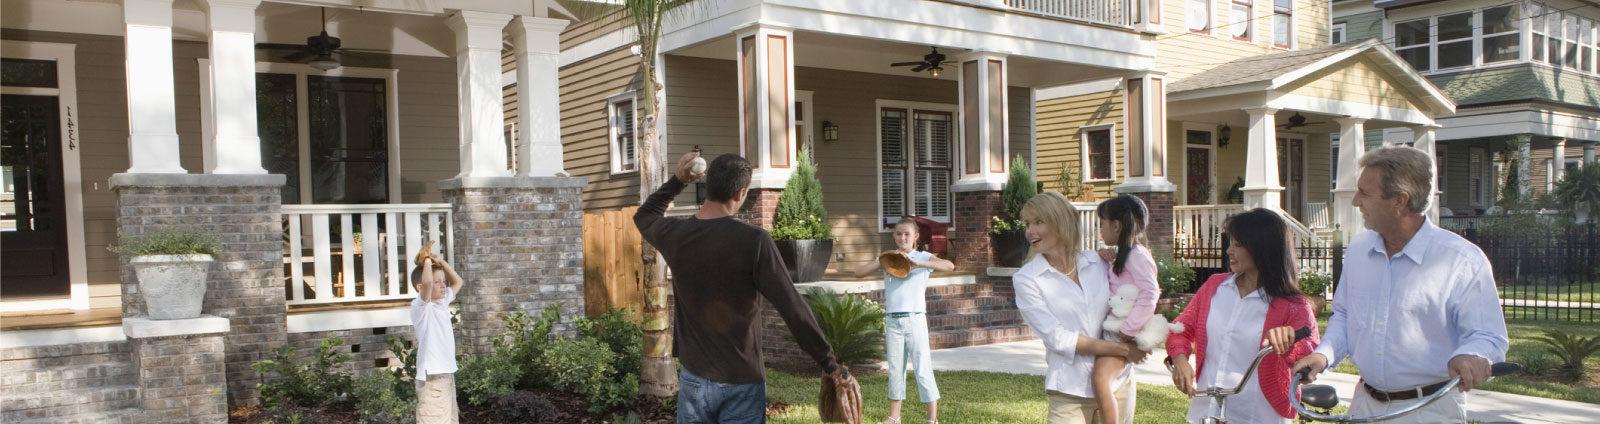 get involved header, Residential Neighborhood photo